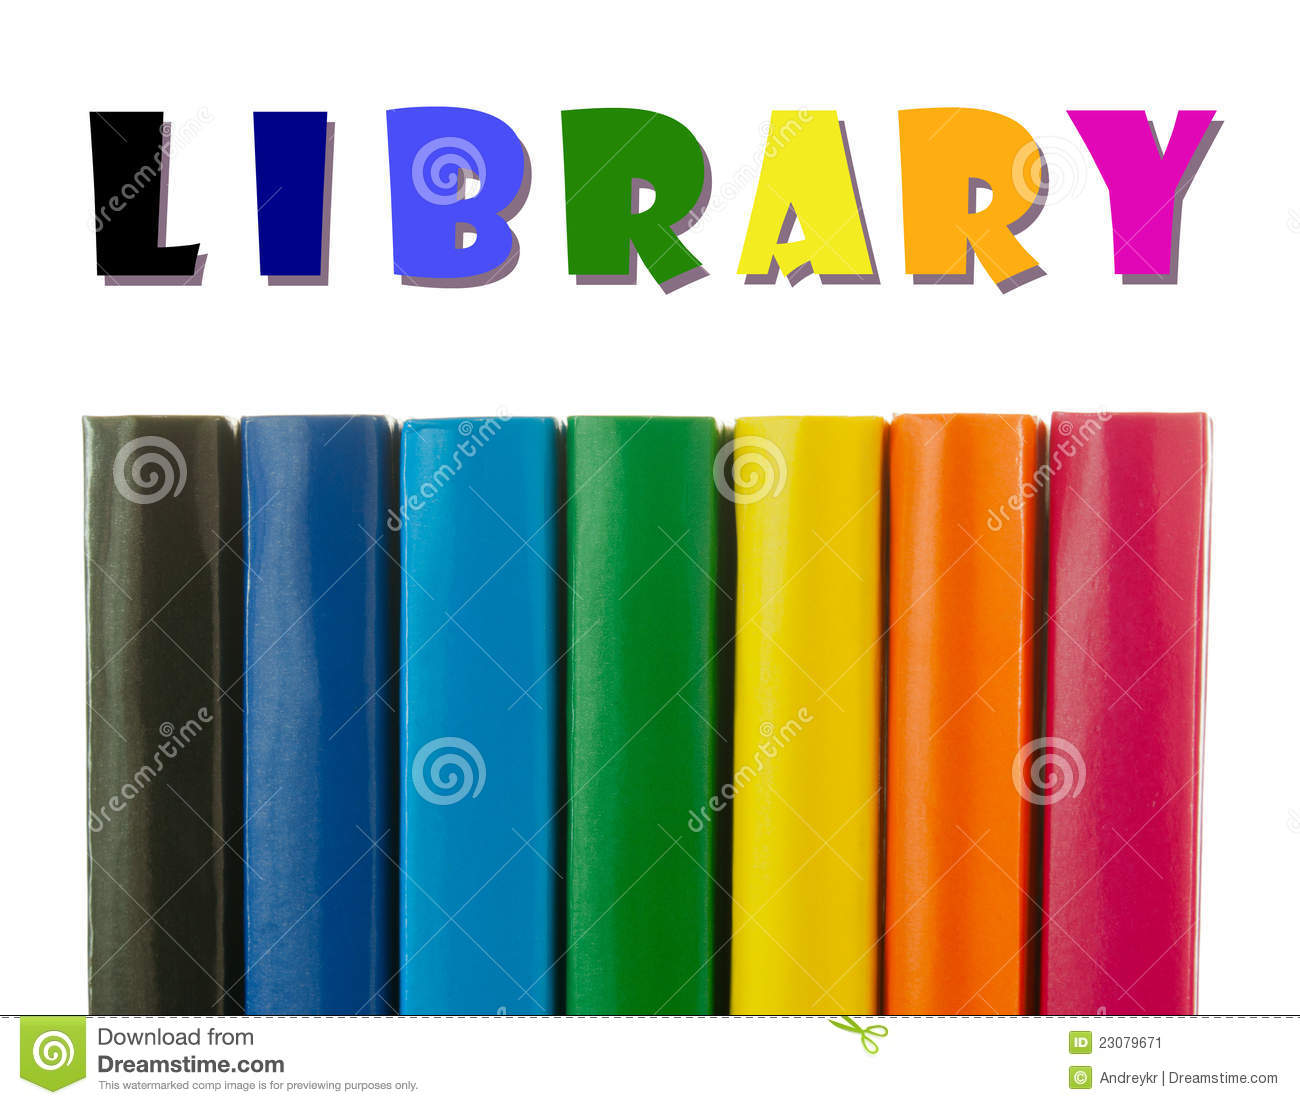 Row books clipart clip free Row books clipart orange yellow free - ClipartFest clip free